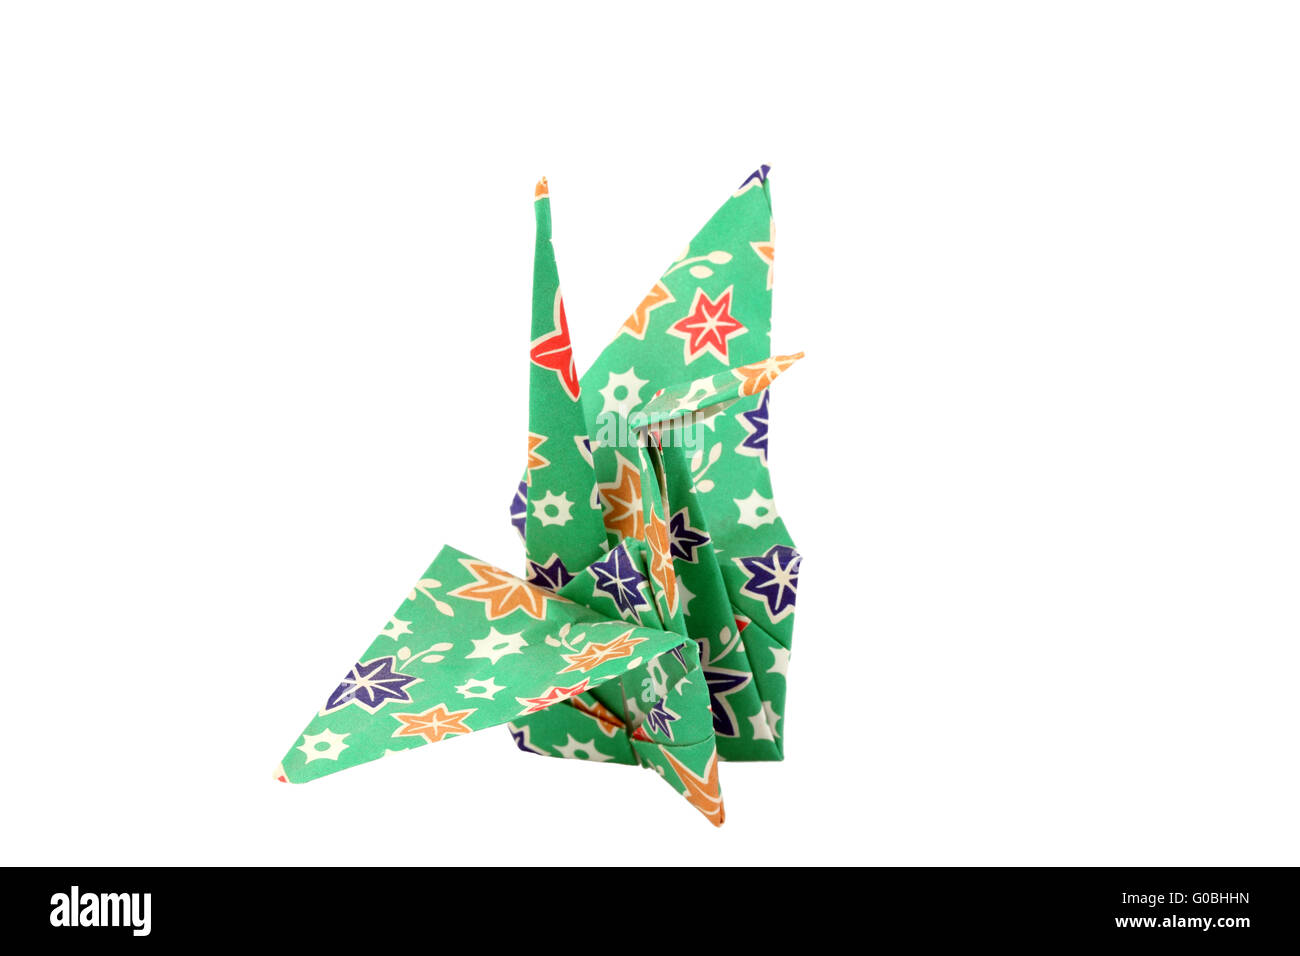 Nahaufnahme des Origami Papier Kran grün mit bunten Mustern Stockbild